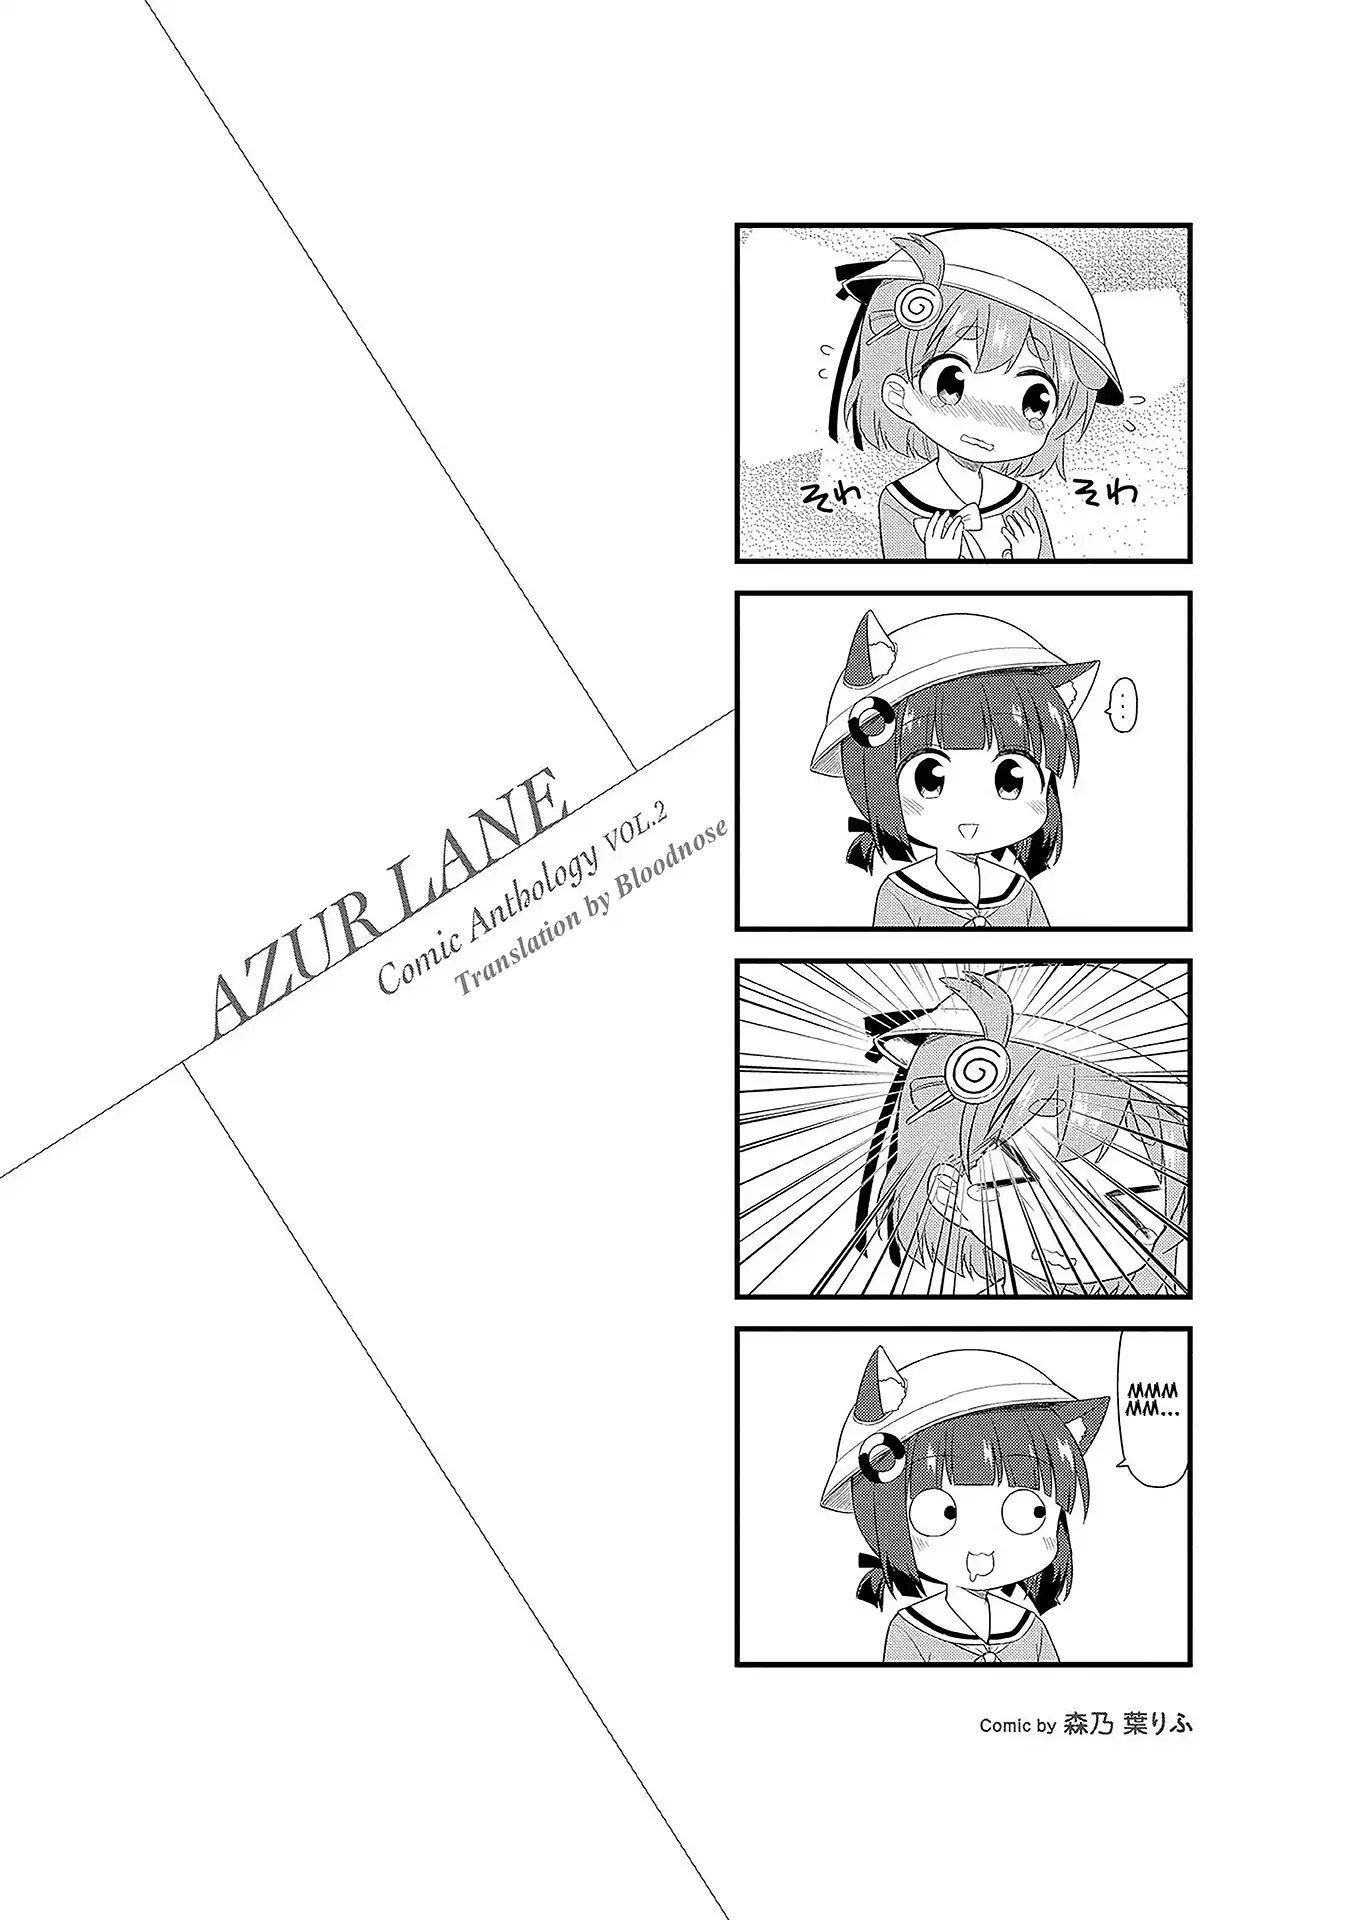 Manga Azur Lane Comic Anthology - Chapter 29 Page 2